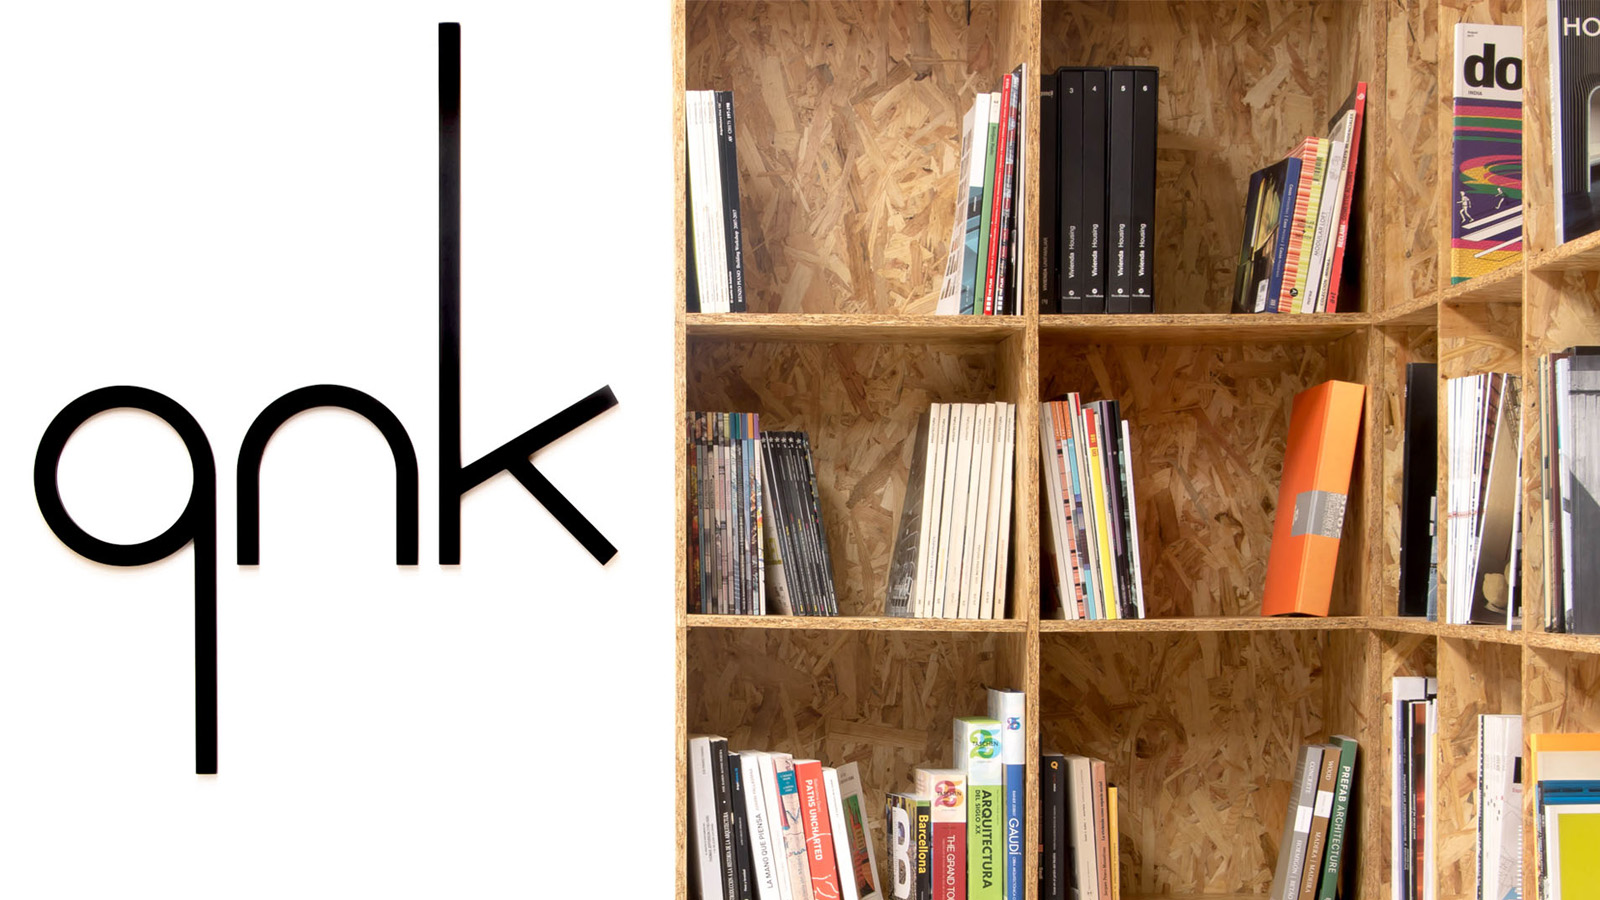 Estudio qnk Detalle librería